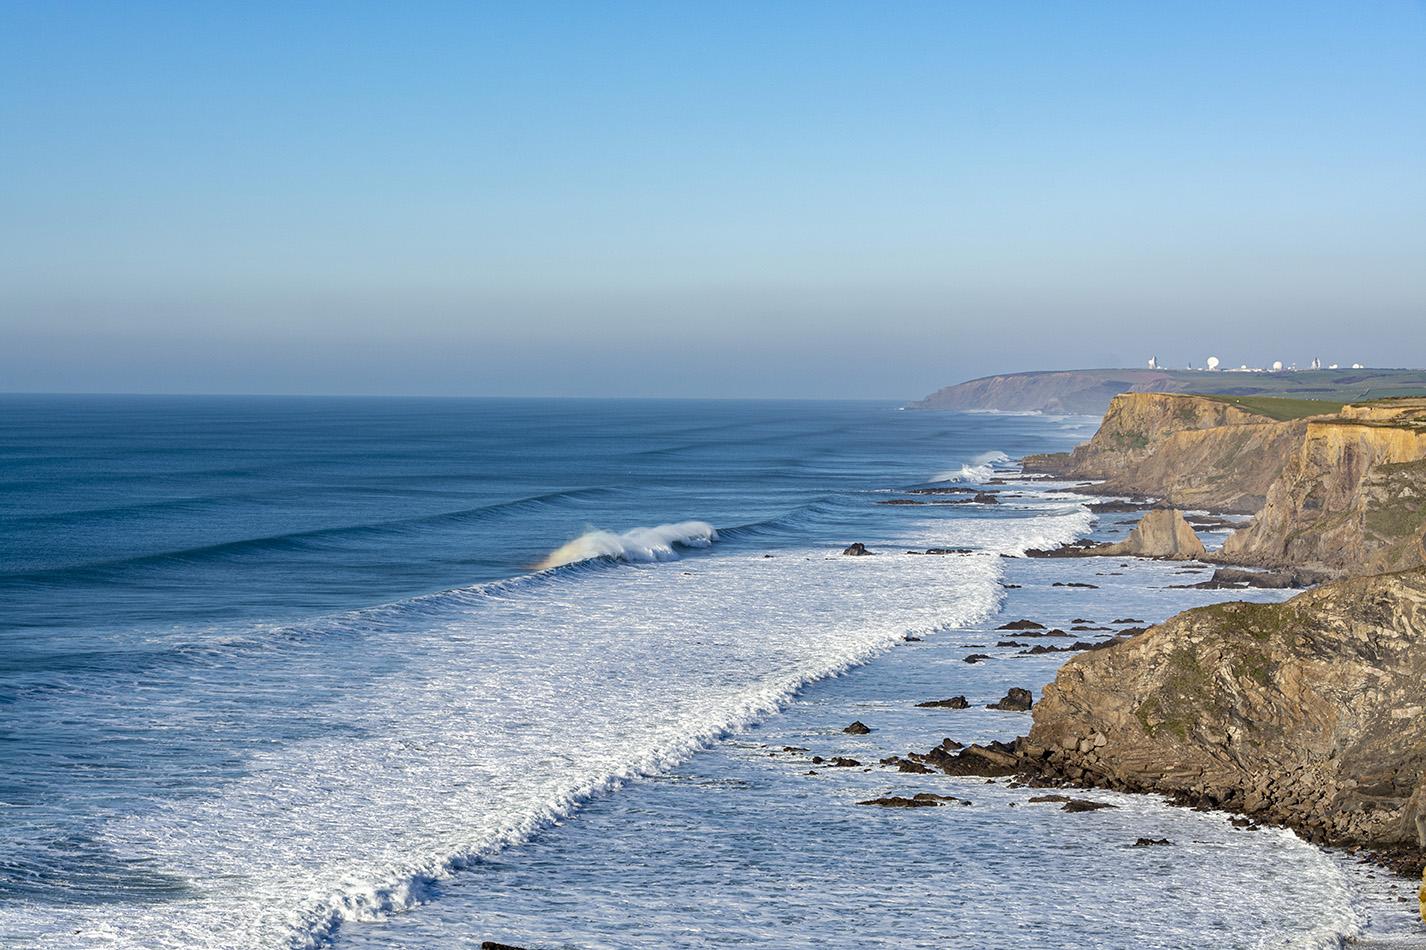 Bumbling Tide - Widemouth